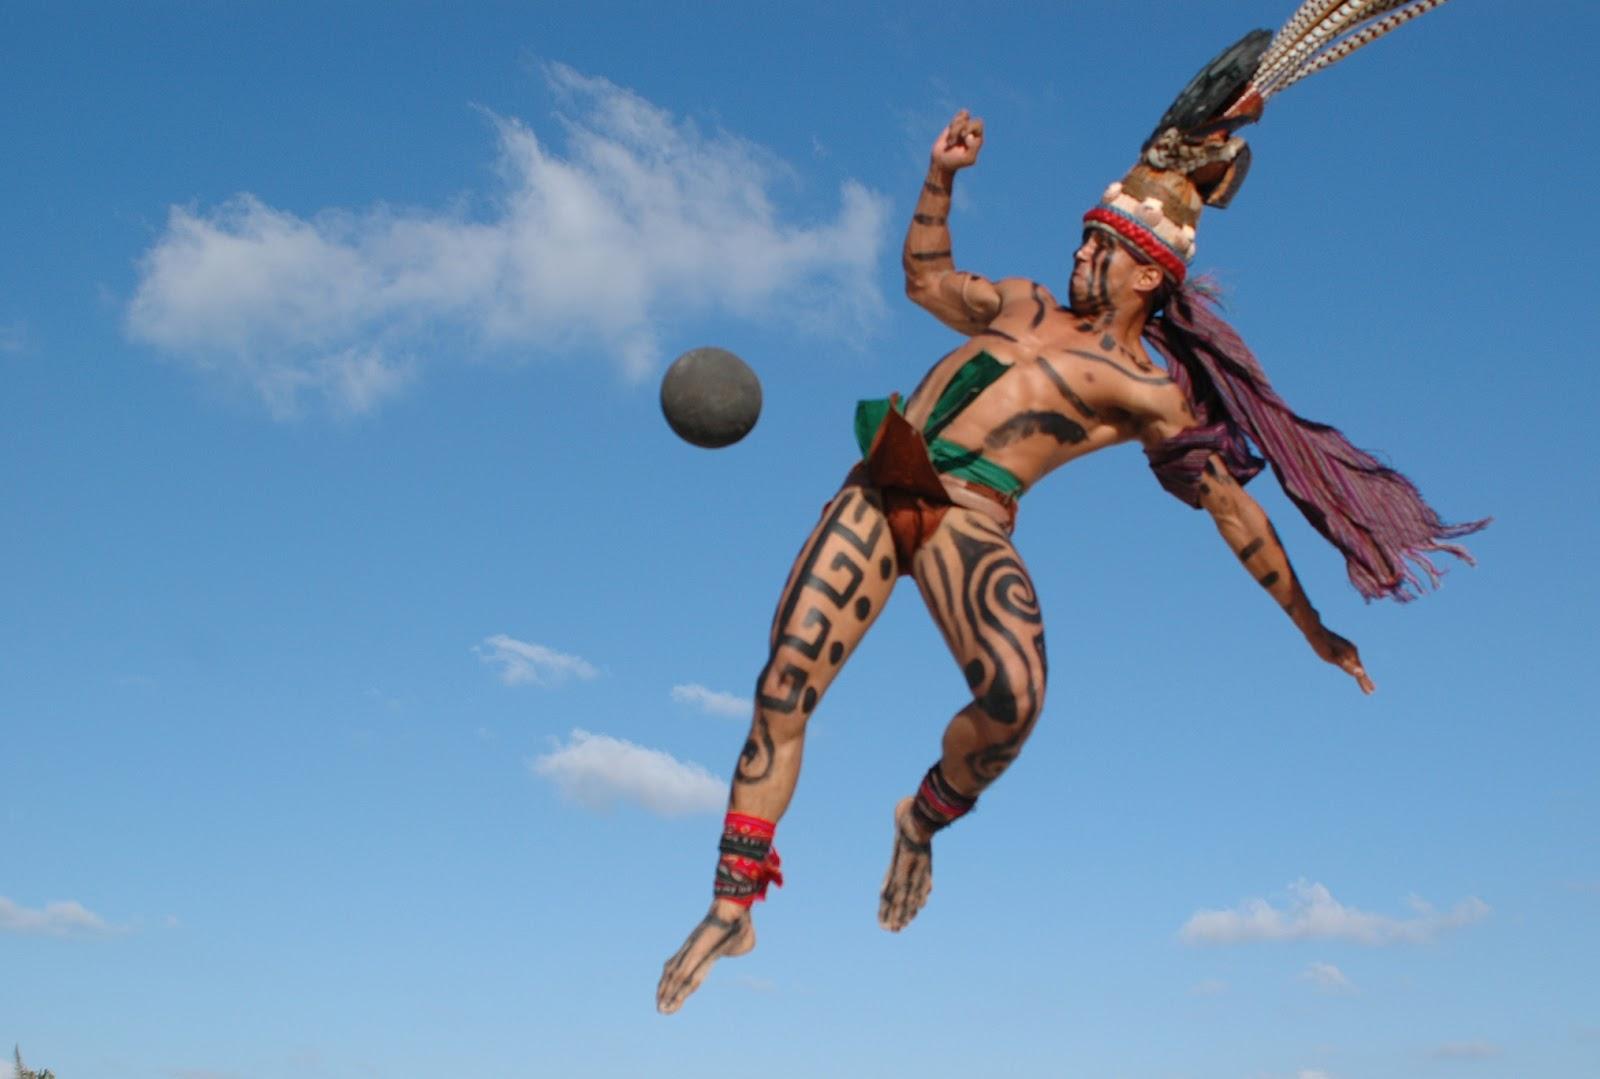 Datei:Pok ta pok ballgame maya indians mexico 4.jpg